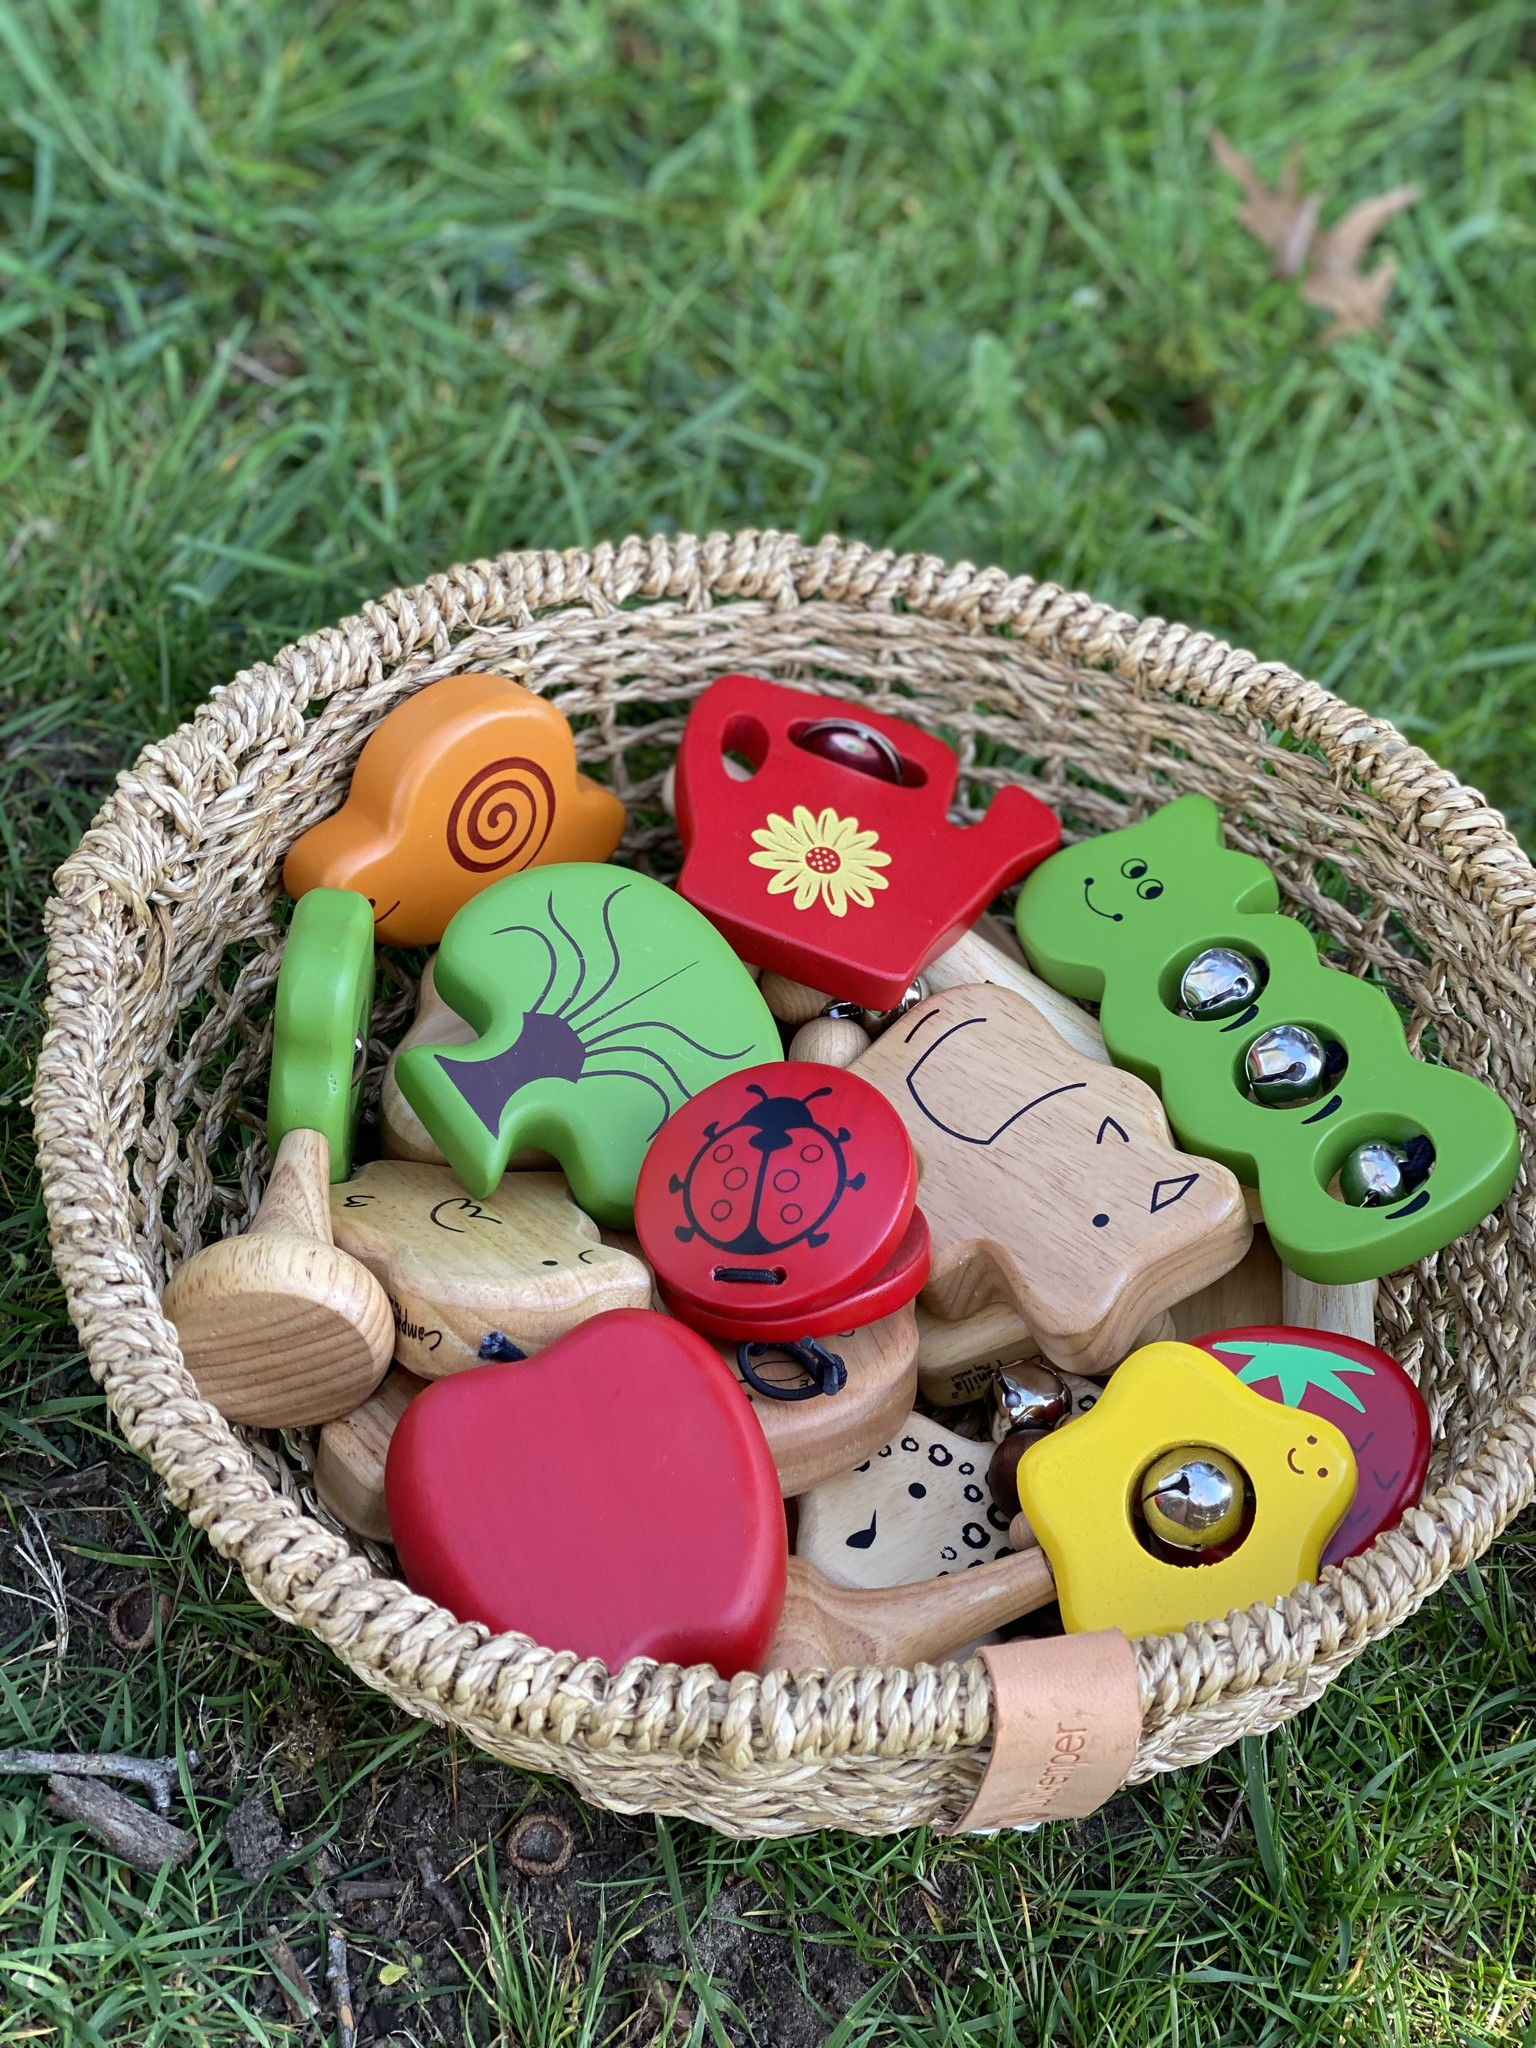 Percussie Muziek Set - Garden Friends (3-delig)